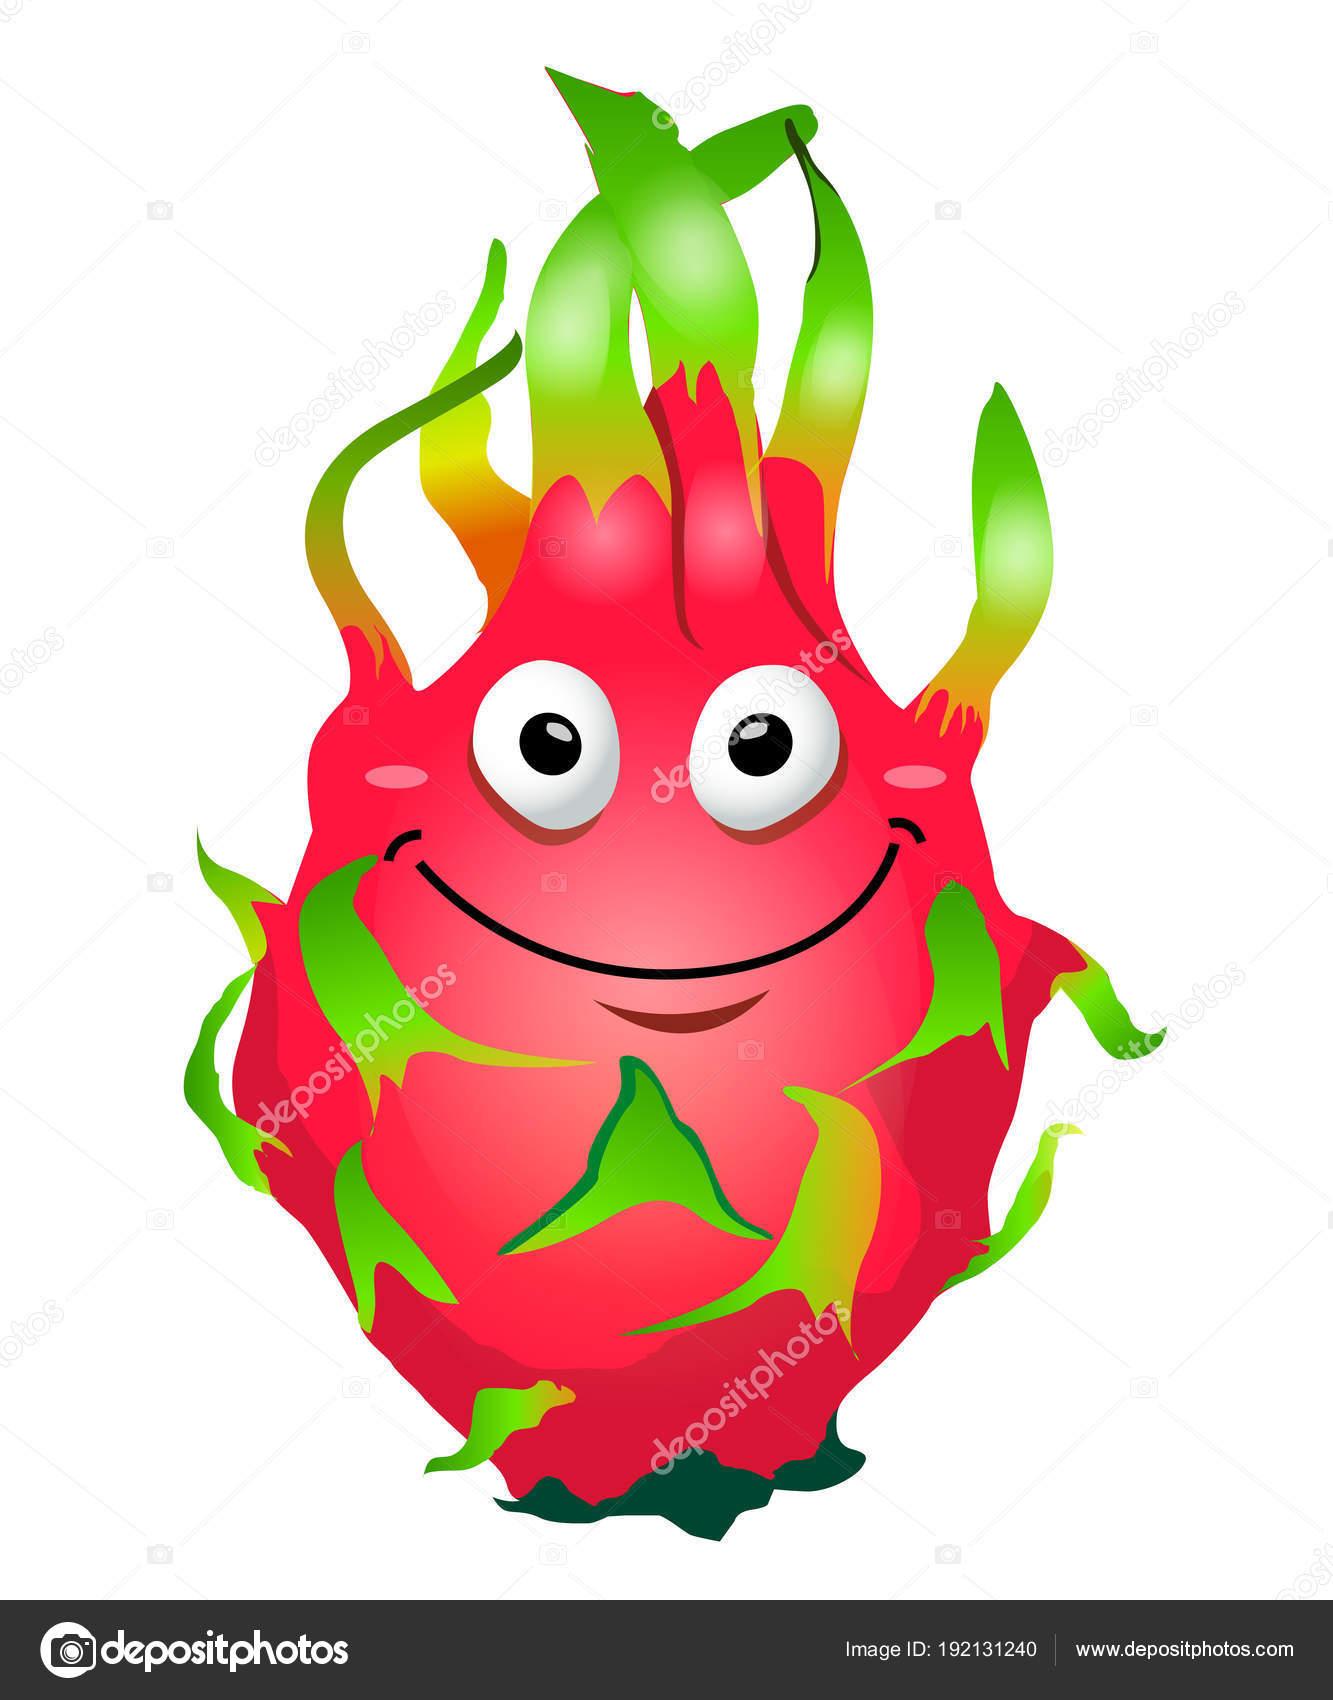 Cartoon fun dragon fruit character. Pitaya. Vector illustration.